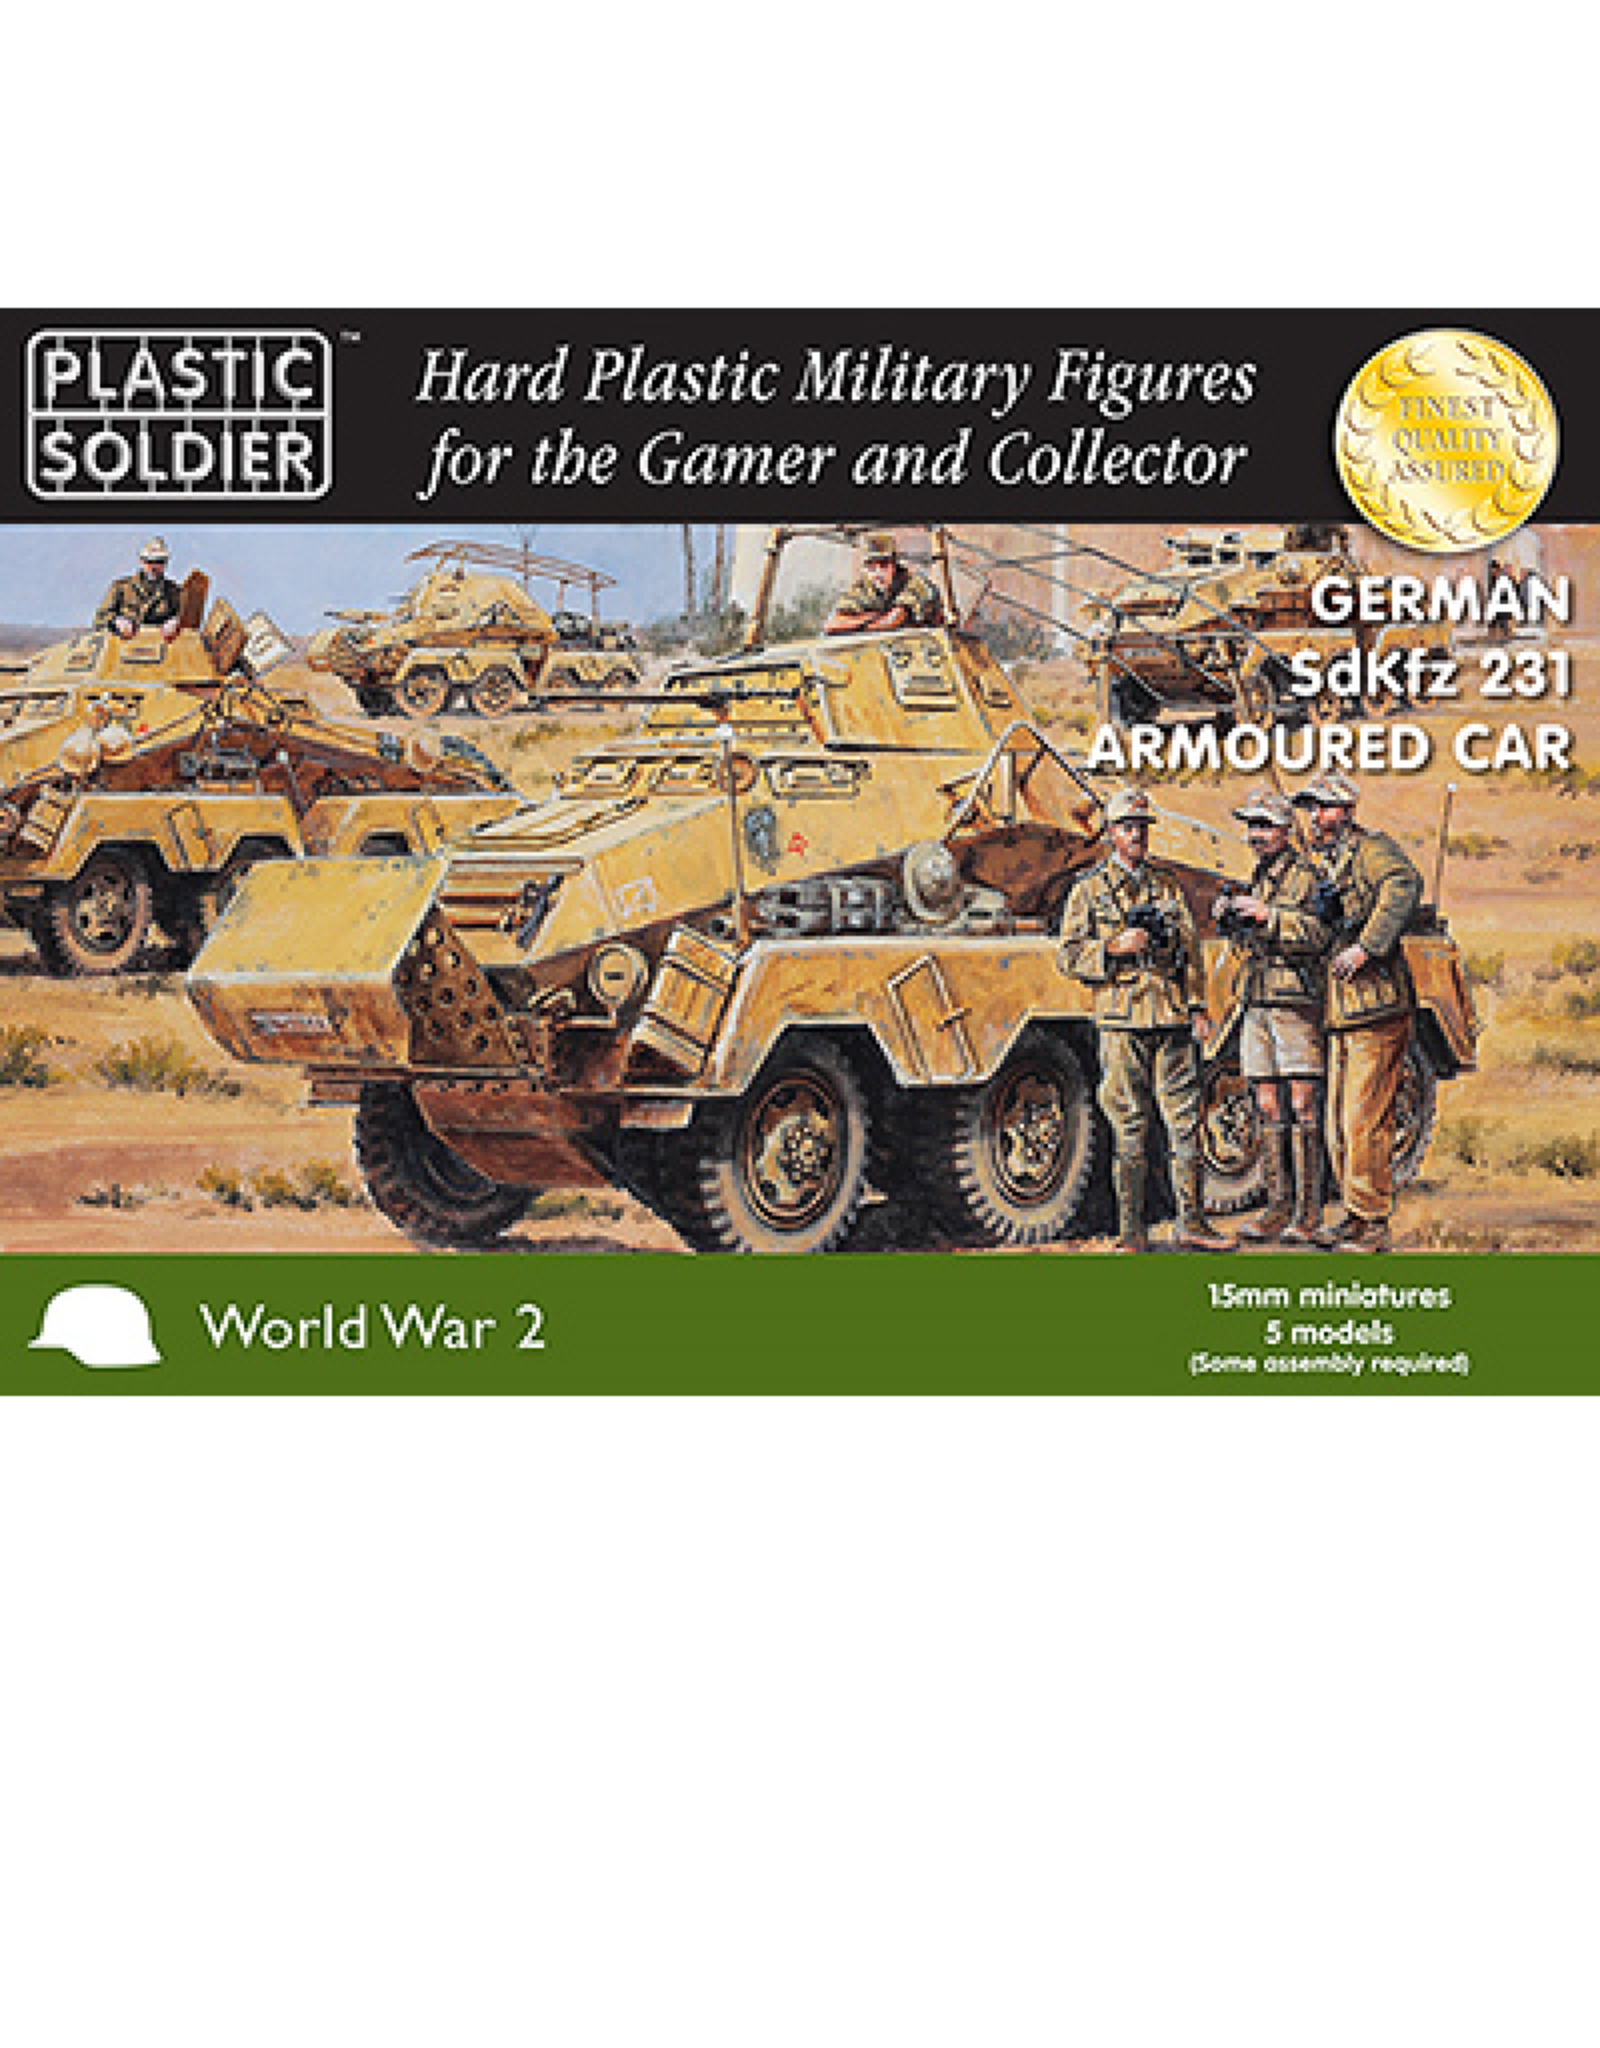 Plastic Soldier Company German SdKfz 231 8 rad Armoured Car